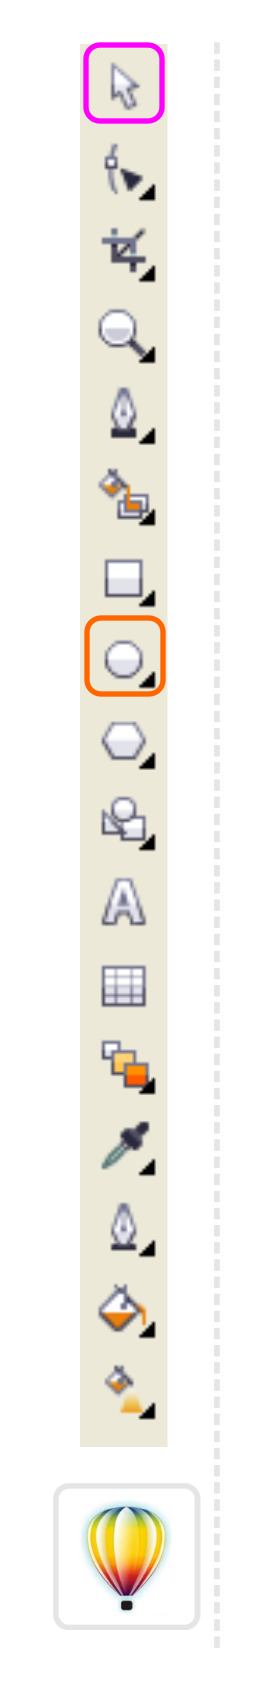 2Dgameartguru CorelDraw toolbar